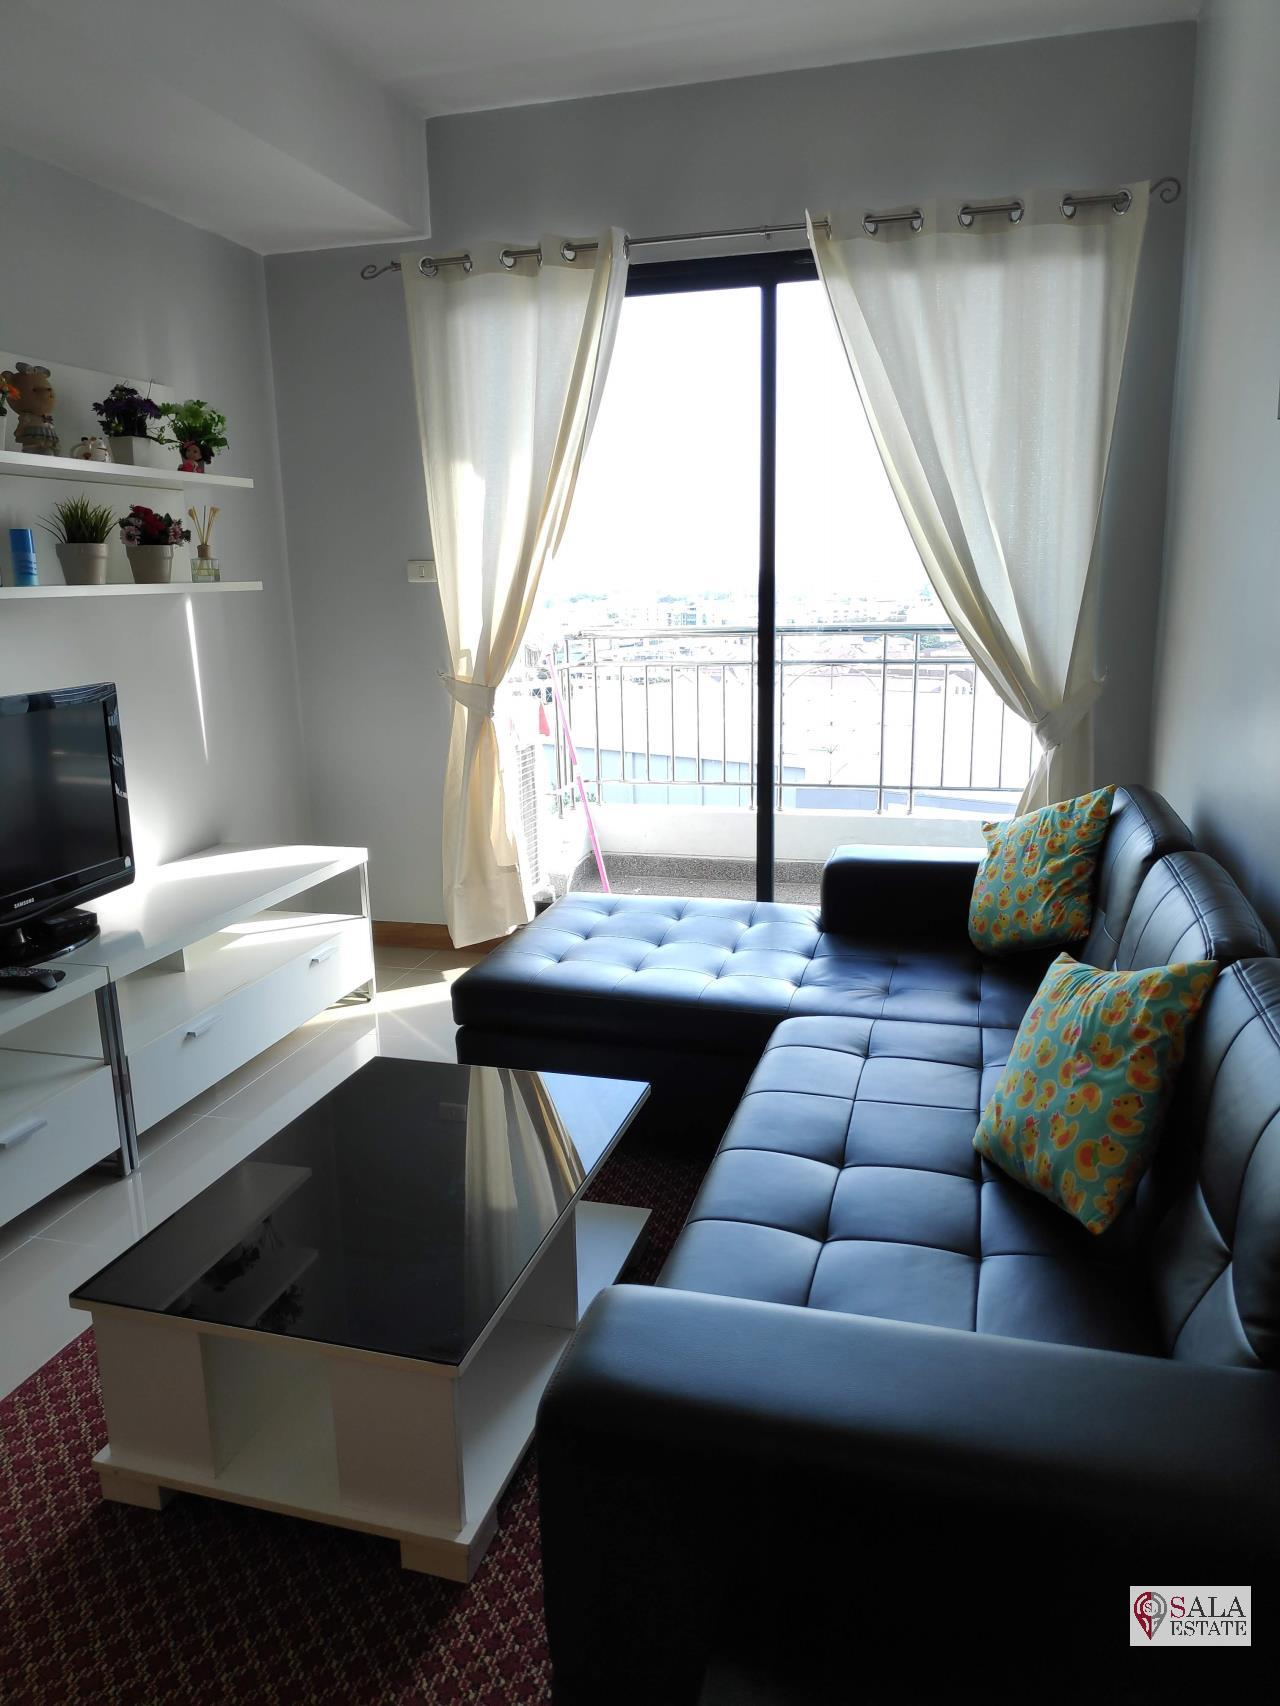 SALA ESTATE Agency's SUPALAI PREMIER NARATHIWAS – BTS CHONG NONSI, 1 BEDROOM 1 BATHROOM, FULLY FERNISHED, CITY VIEW 2